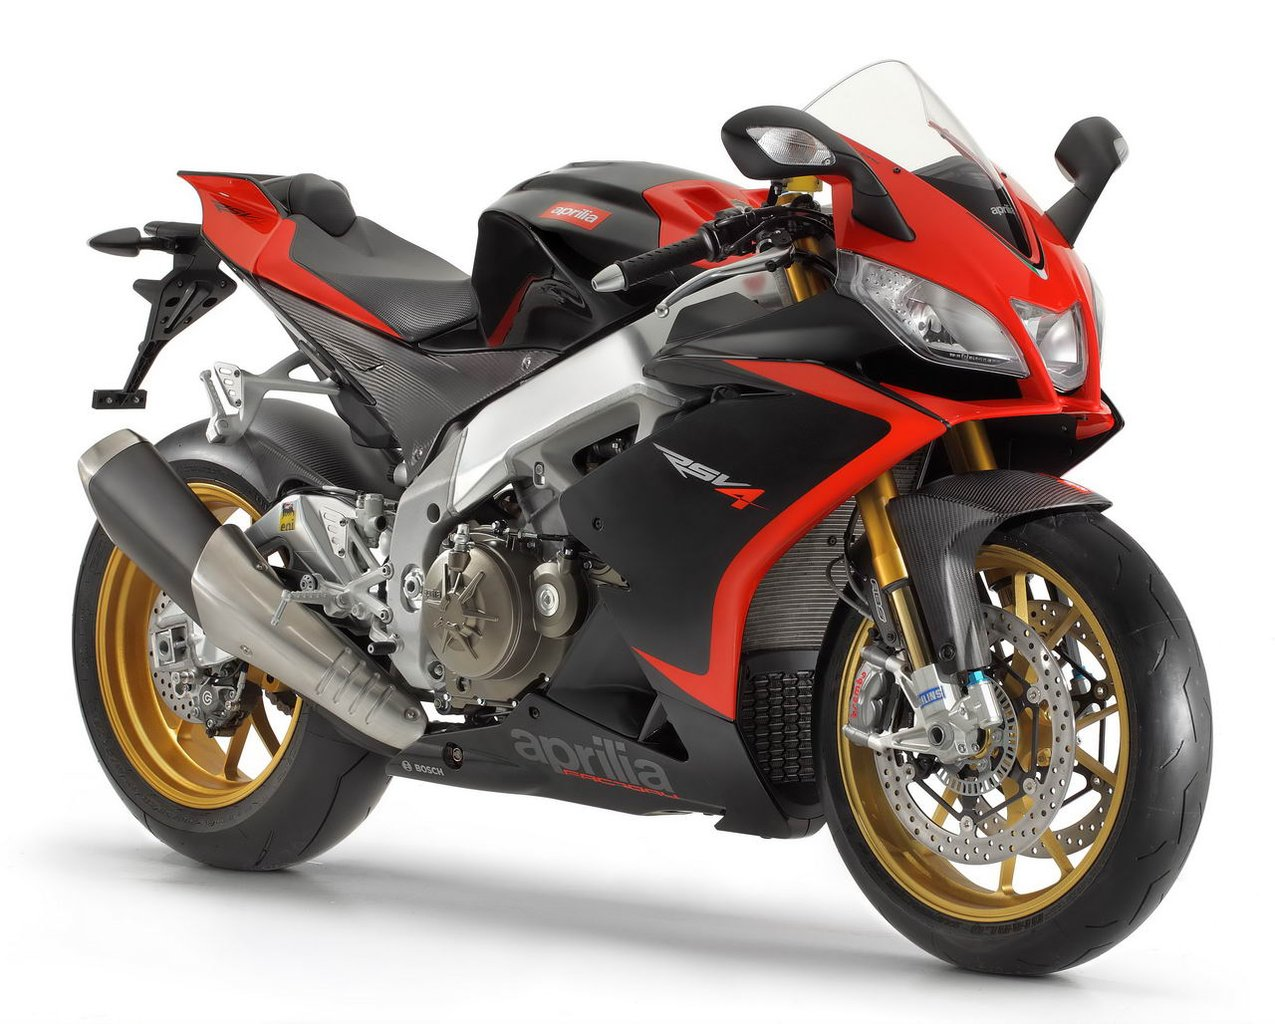 Listino Aprilia SX 125 Moto 50 e 125 - image 14318_aprilia-rsv4factory-abs on http://moto.motori.net